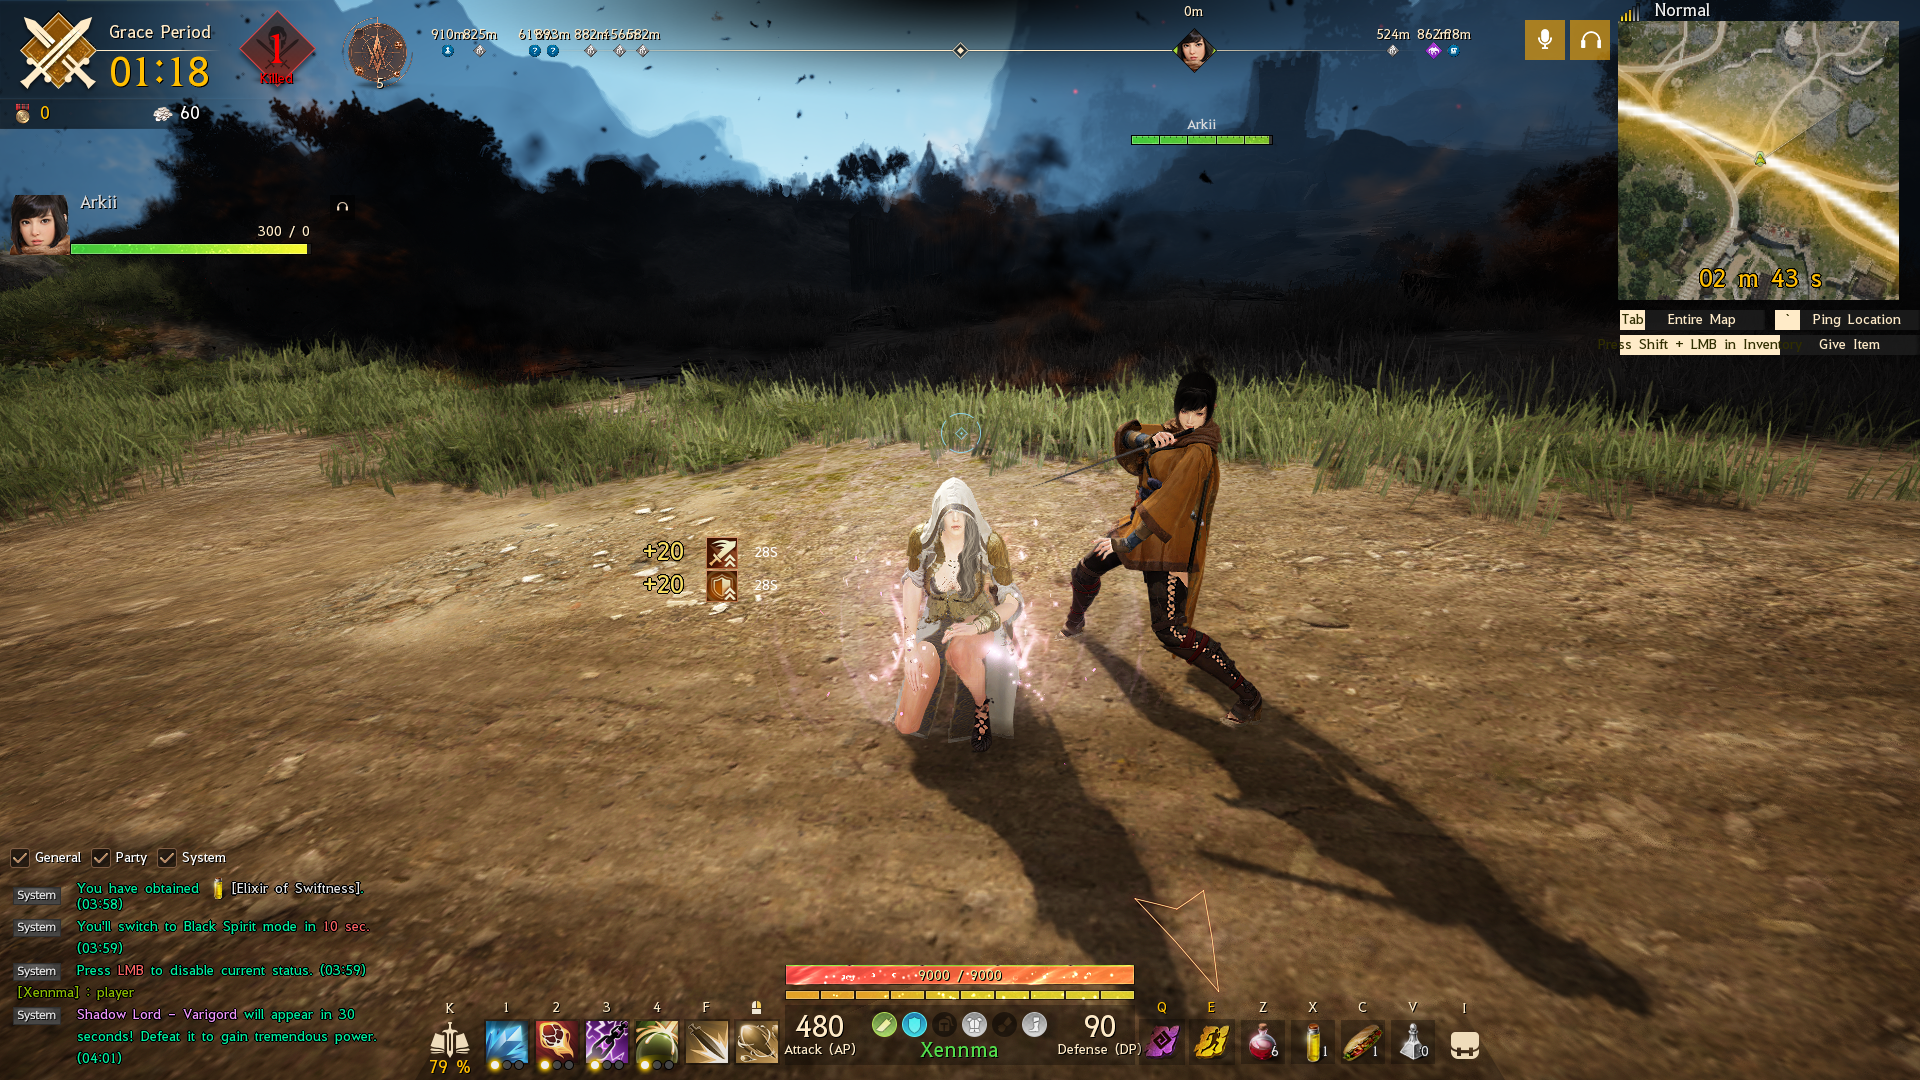 Screenshot of Xennma and Arkii on North America server in Team Mode.